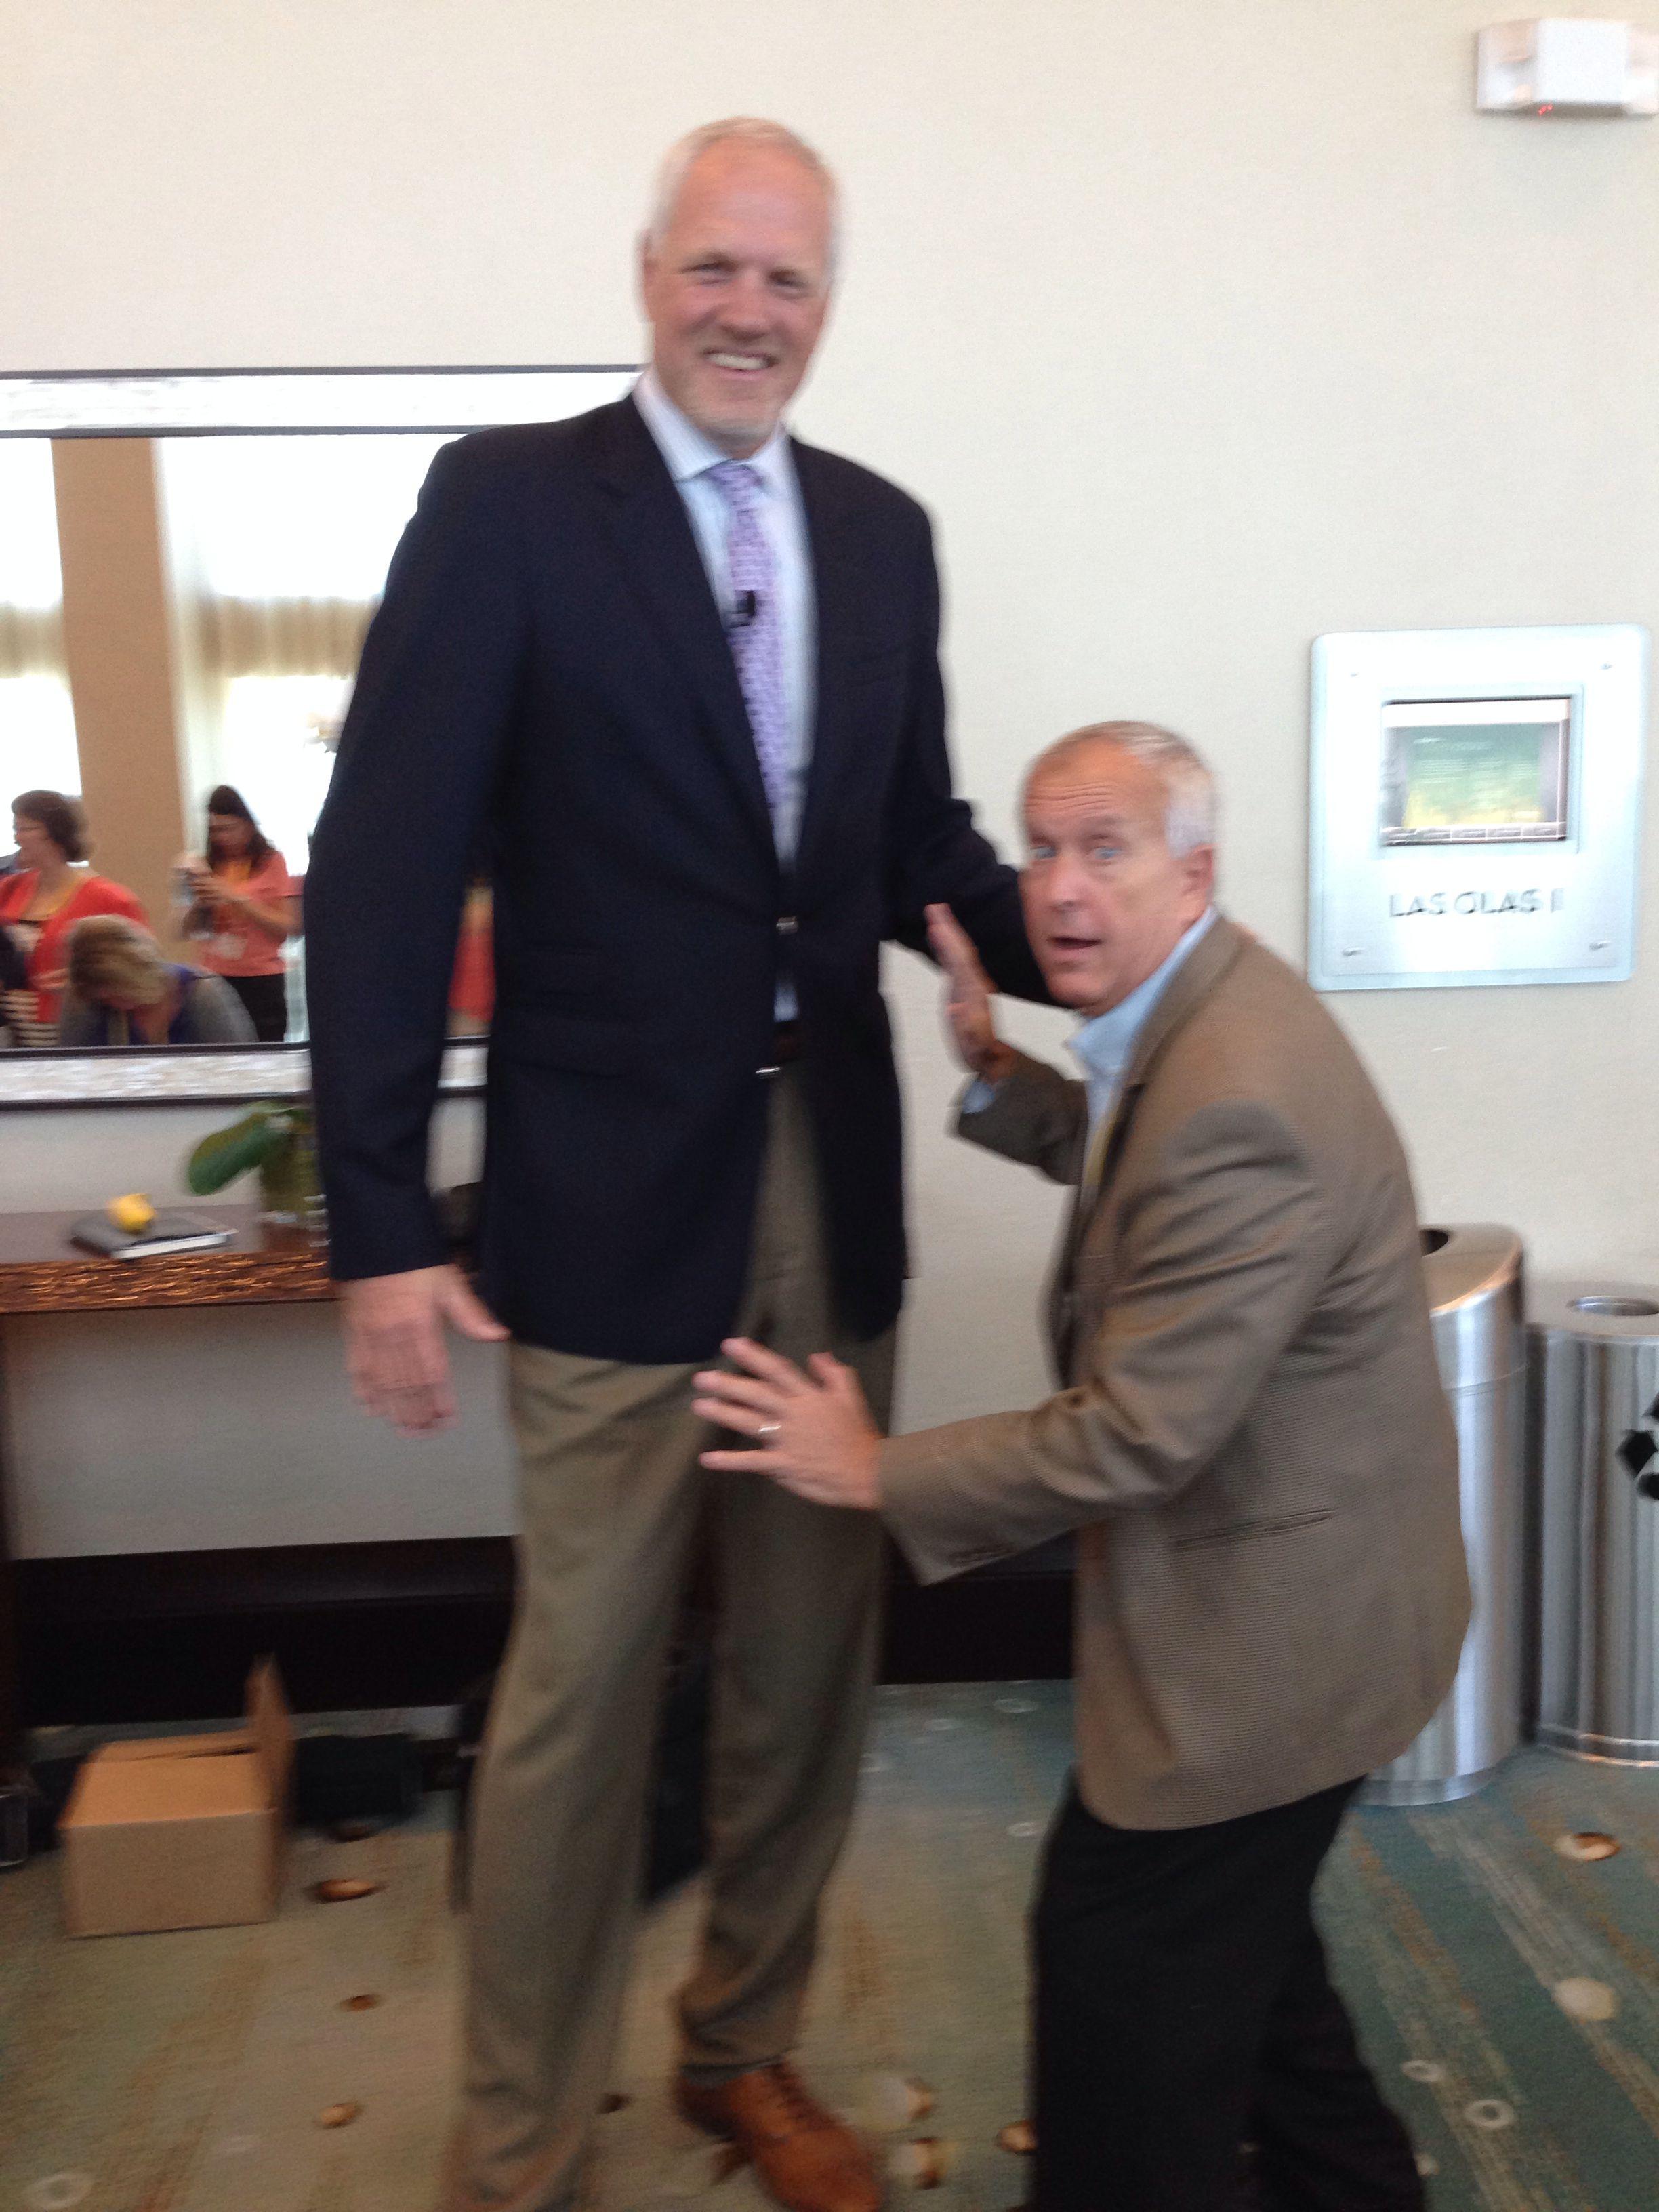 Guarding Mark Eaton - 7ft4 defenseman of Utah Jazz. Gotta play BIG!